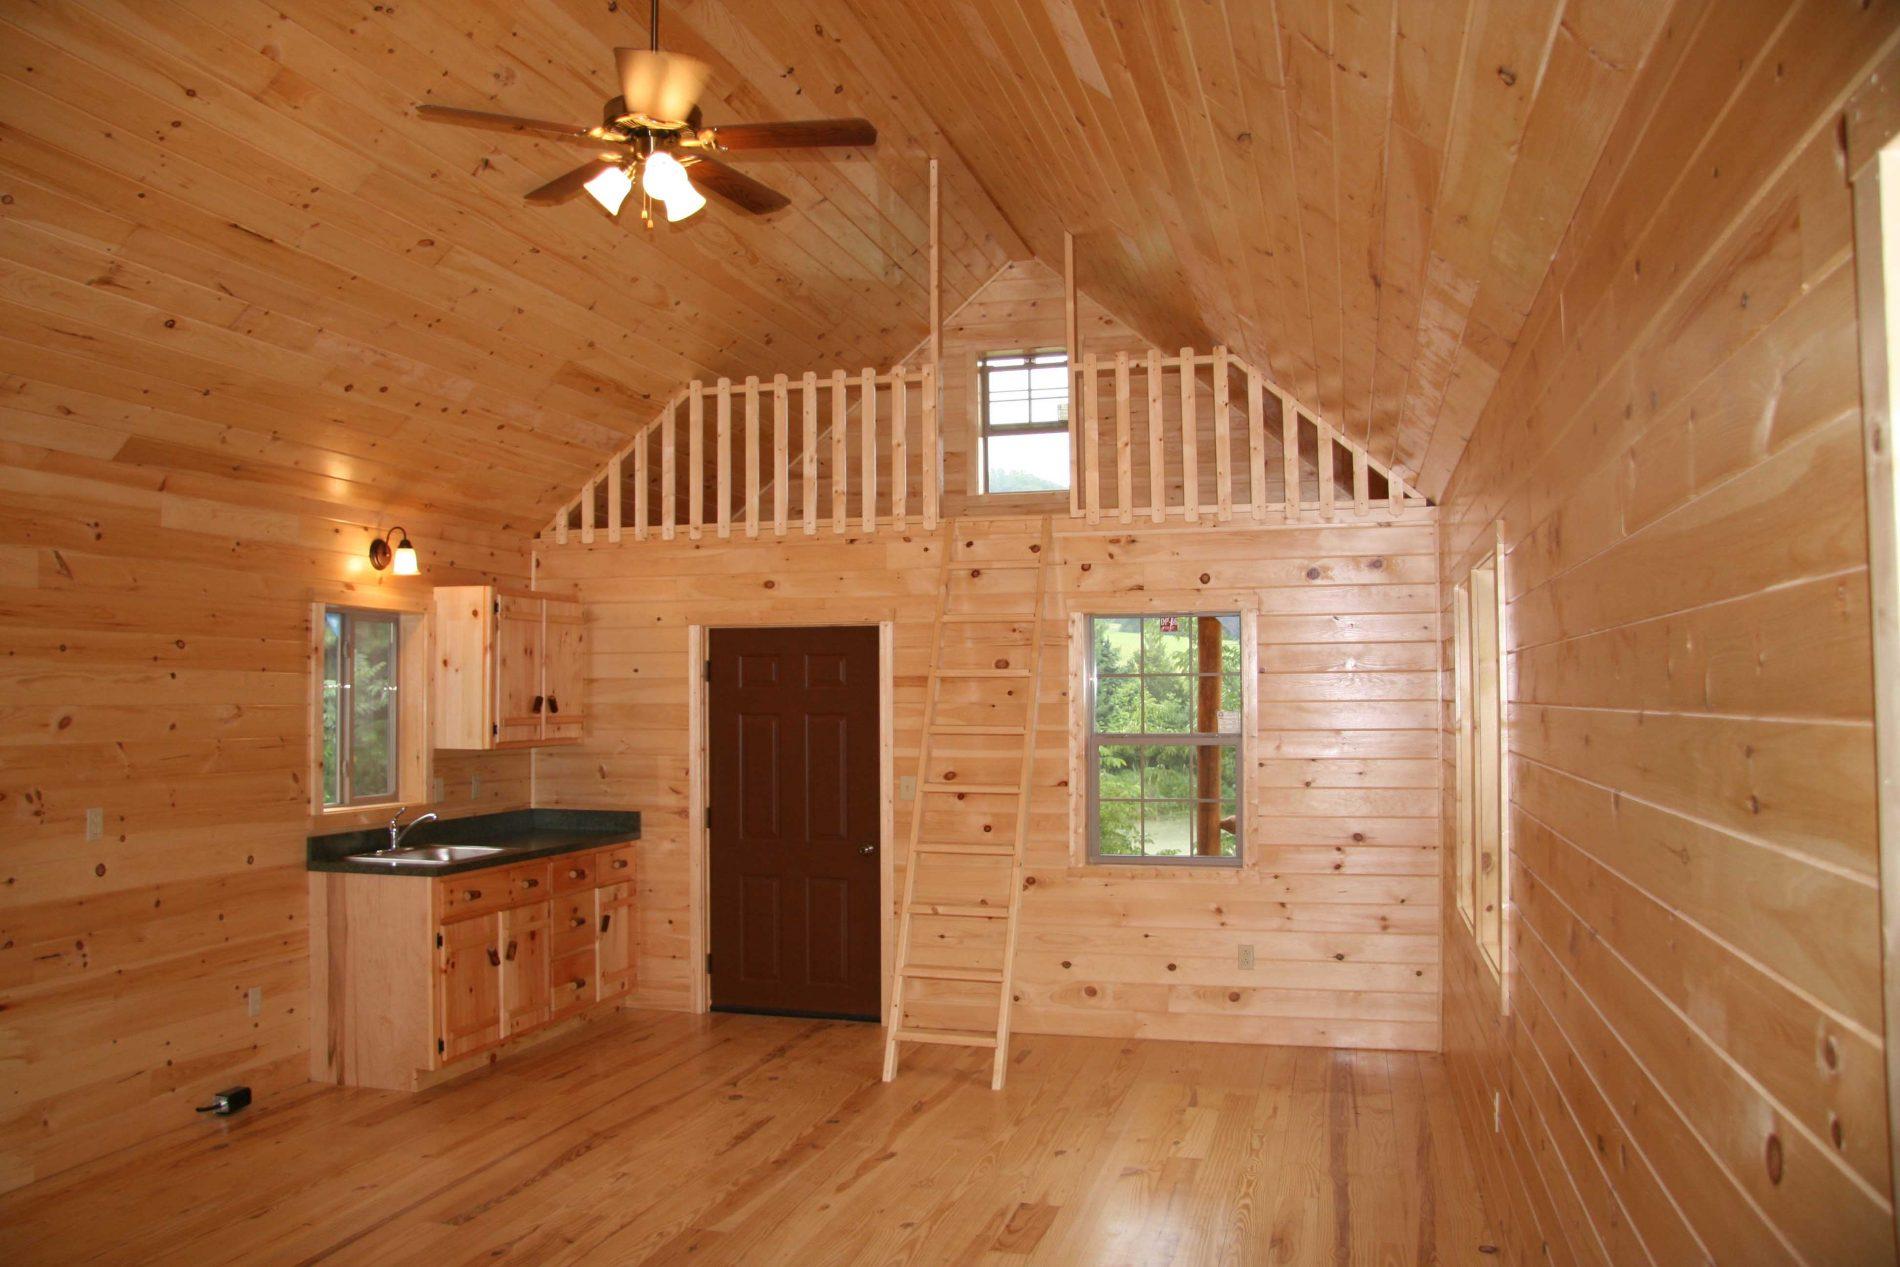 Adirondack log cabin log cabins zook cabins for Adirondack bathroom design